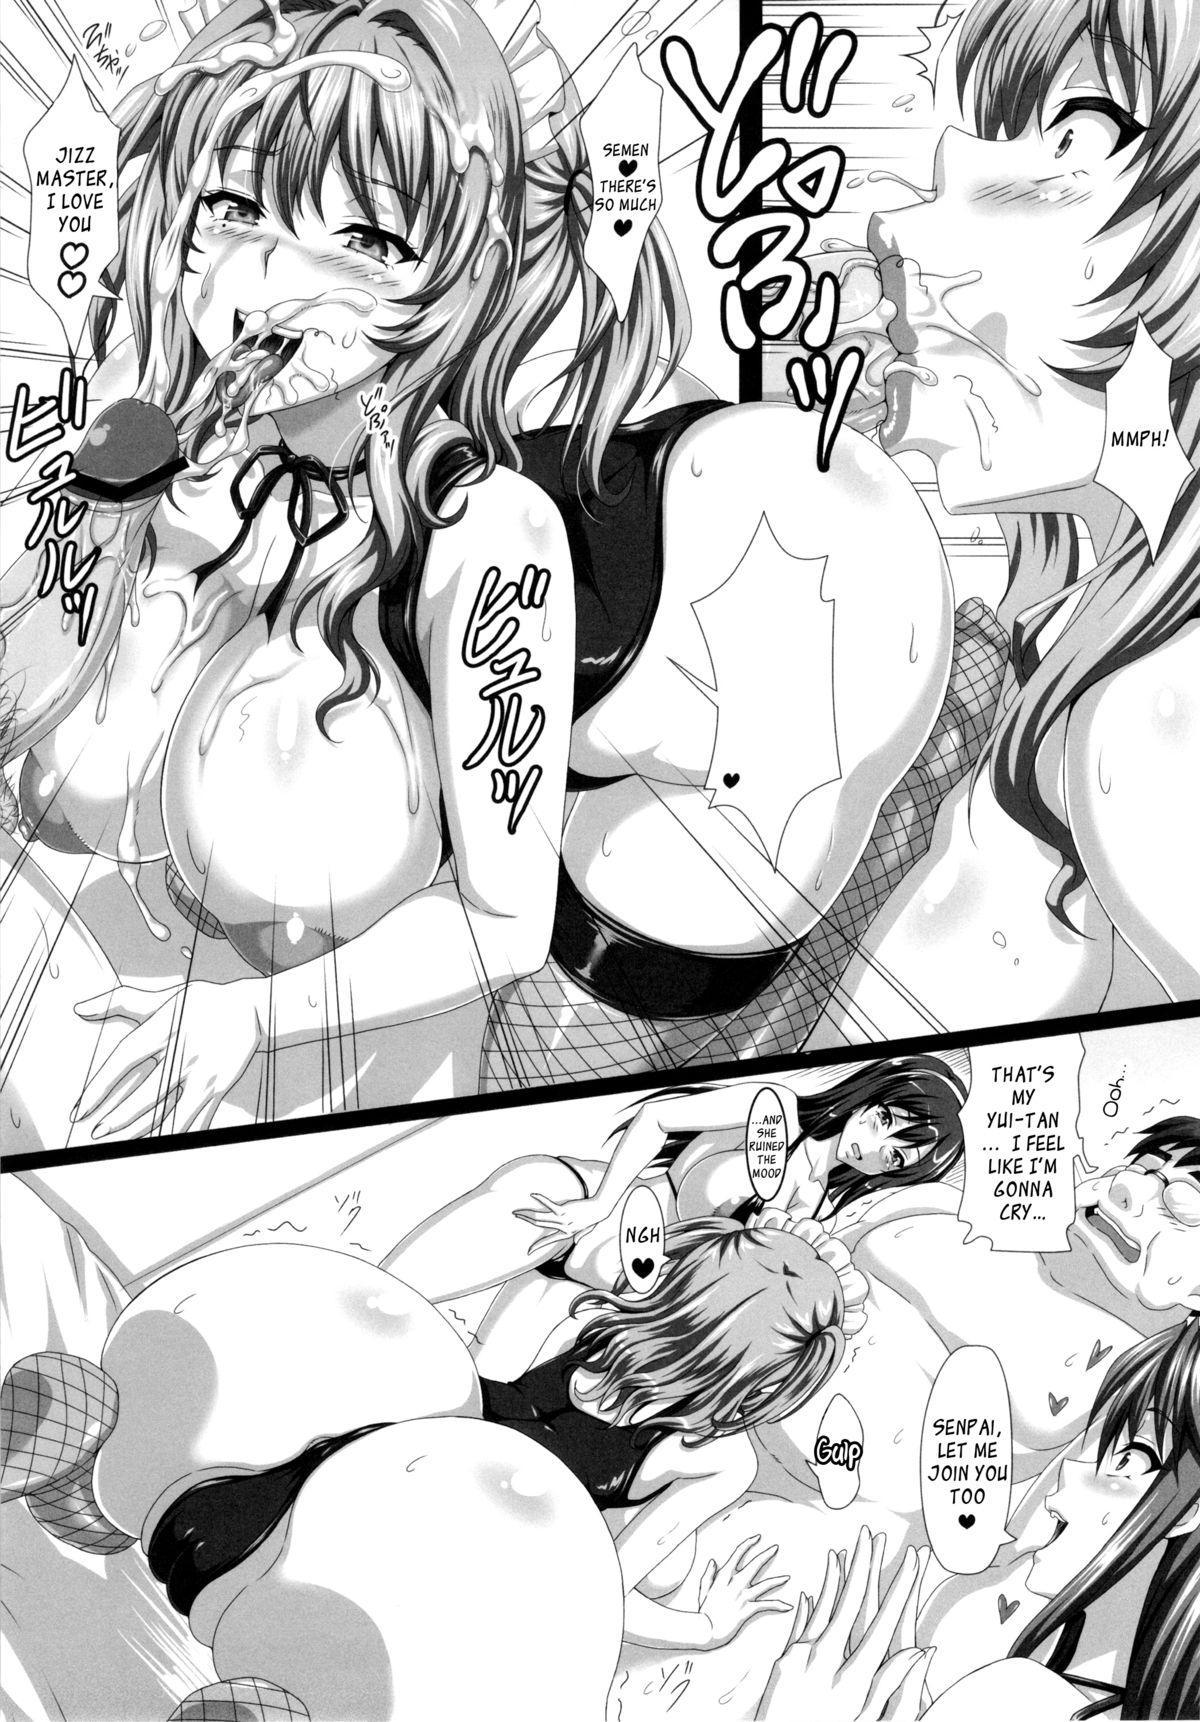 (COMIC1☆7) [KEN] Boku dake no Bakunyuu Onamaid -7 Shuunen- | My Very Own Big Titted Fucktoy Maid -7th Anniversay- (Boku Dake no Bakunyuu Onamaid -7 Shuunen Kinen Goudoushi-) [English] 22